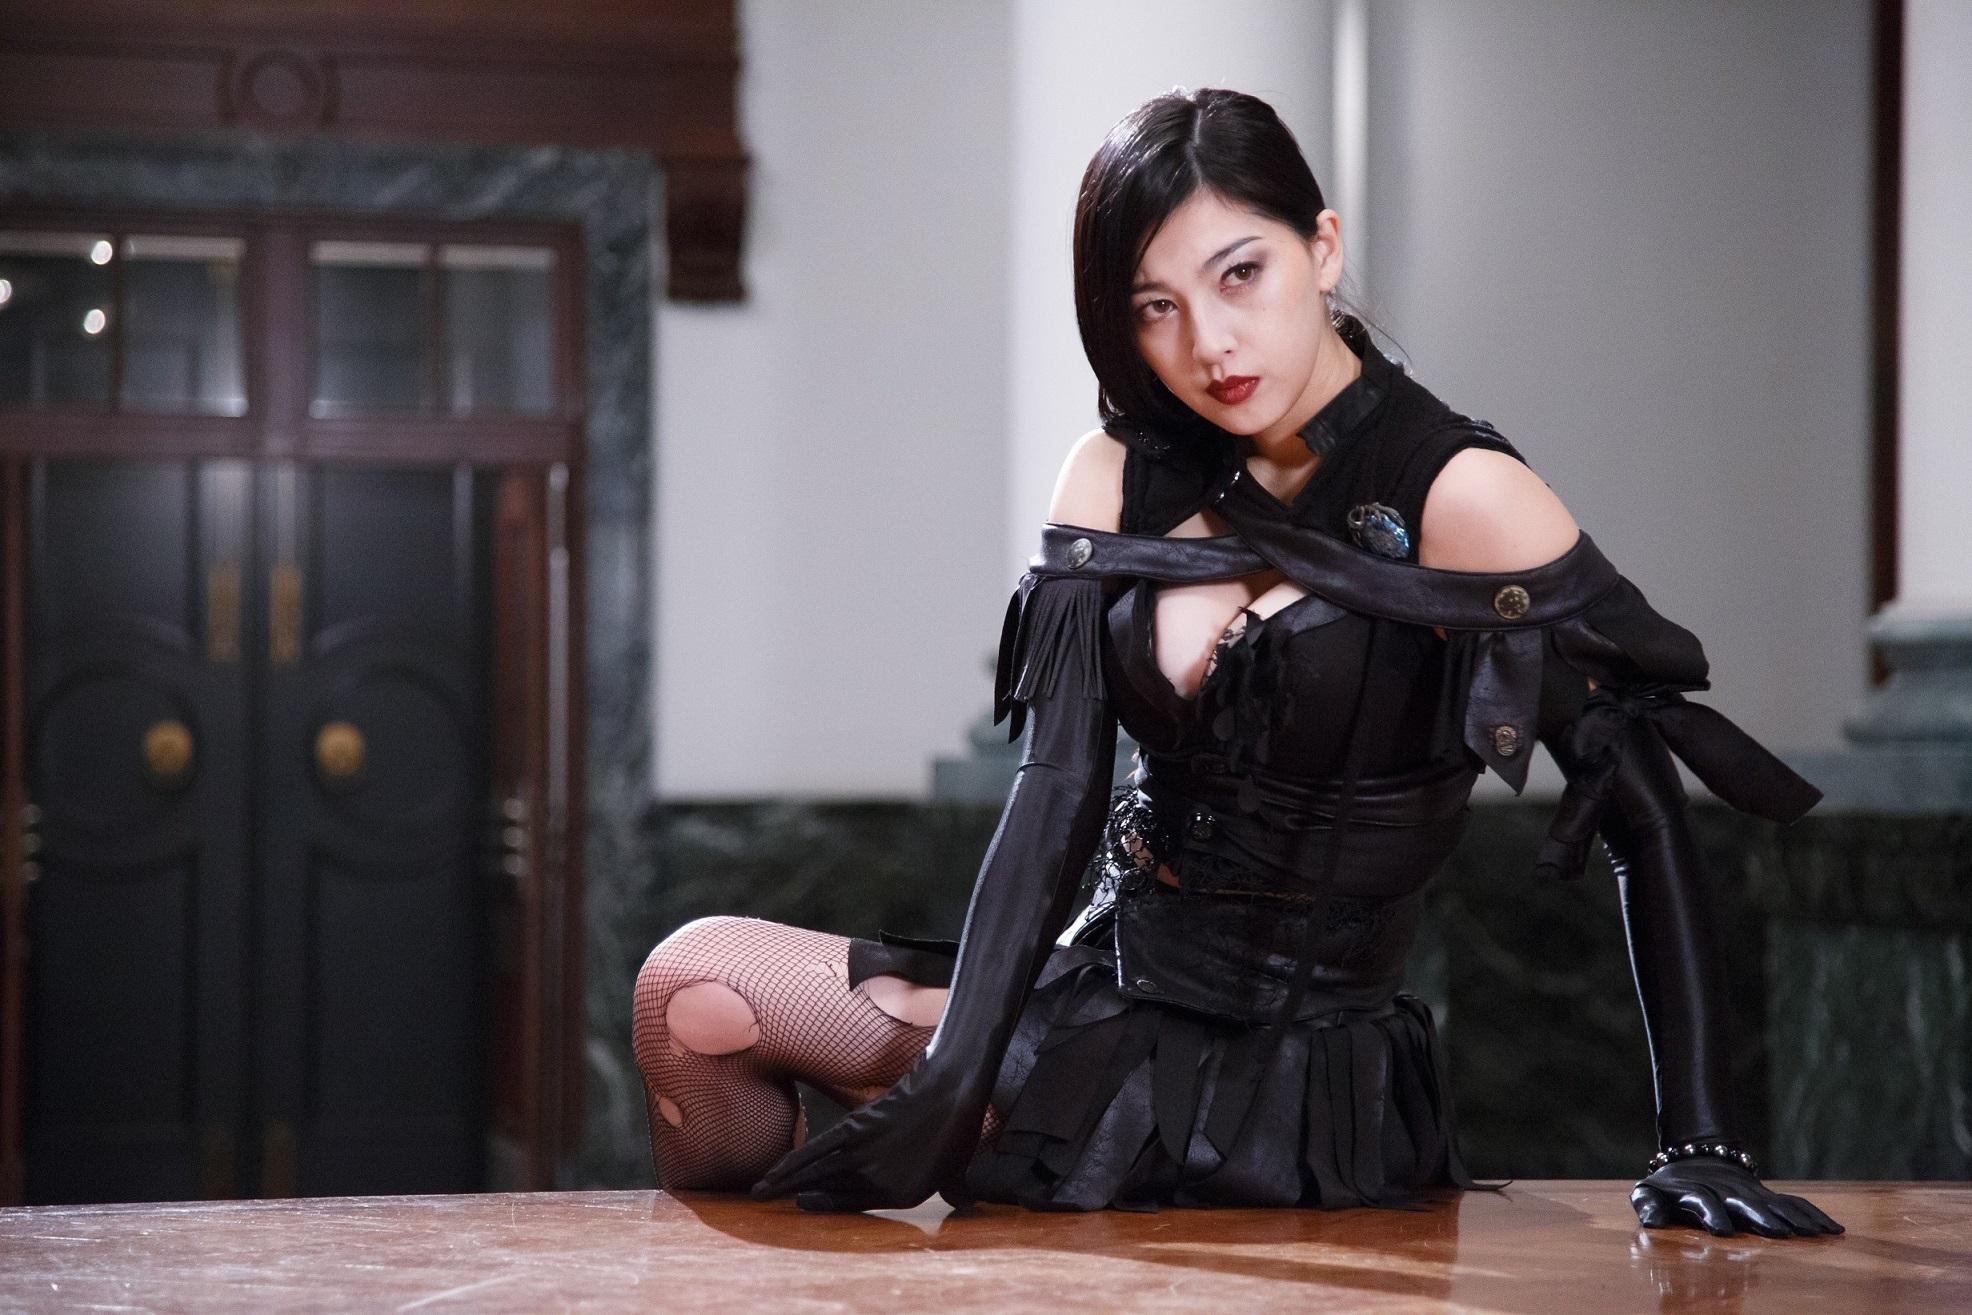 アミリ役・松野井雅 (C)2017「神ノ牙」雨宮慶太/東北新社